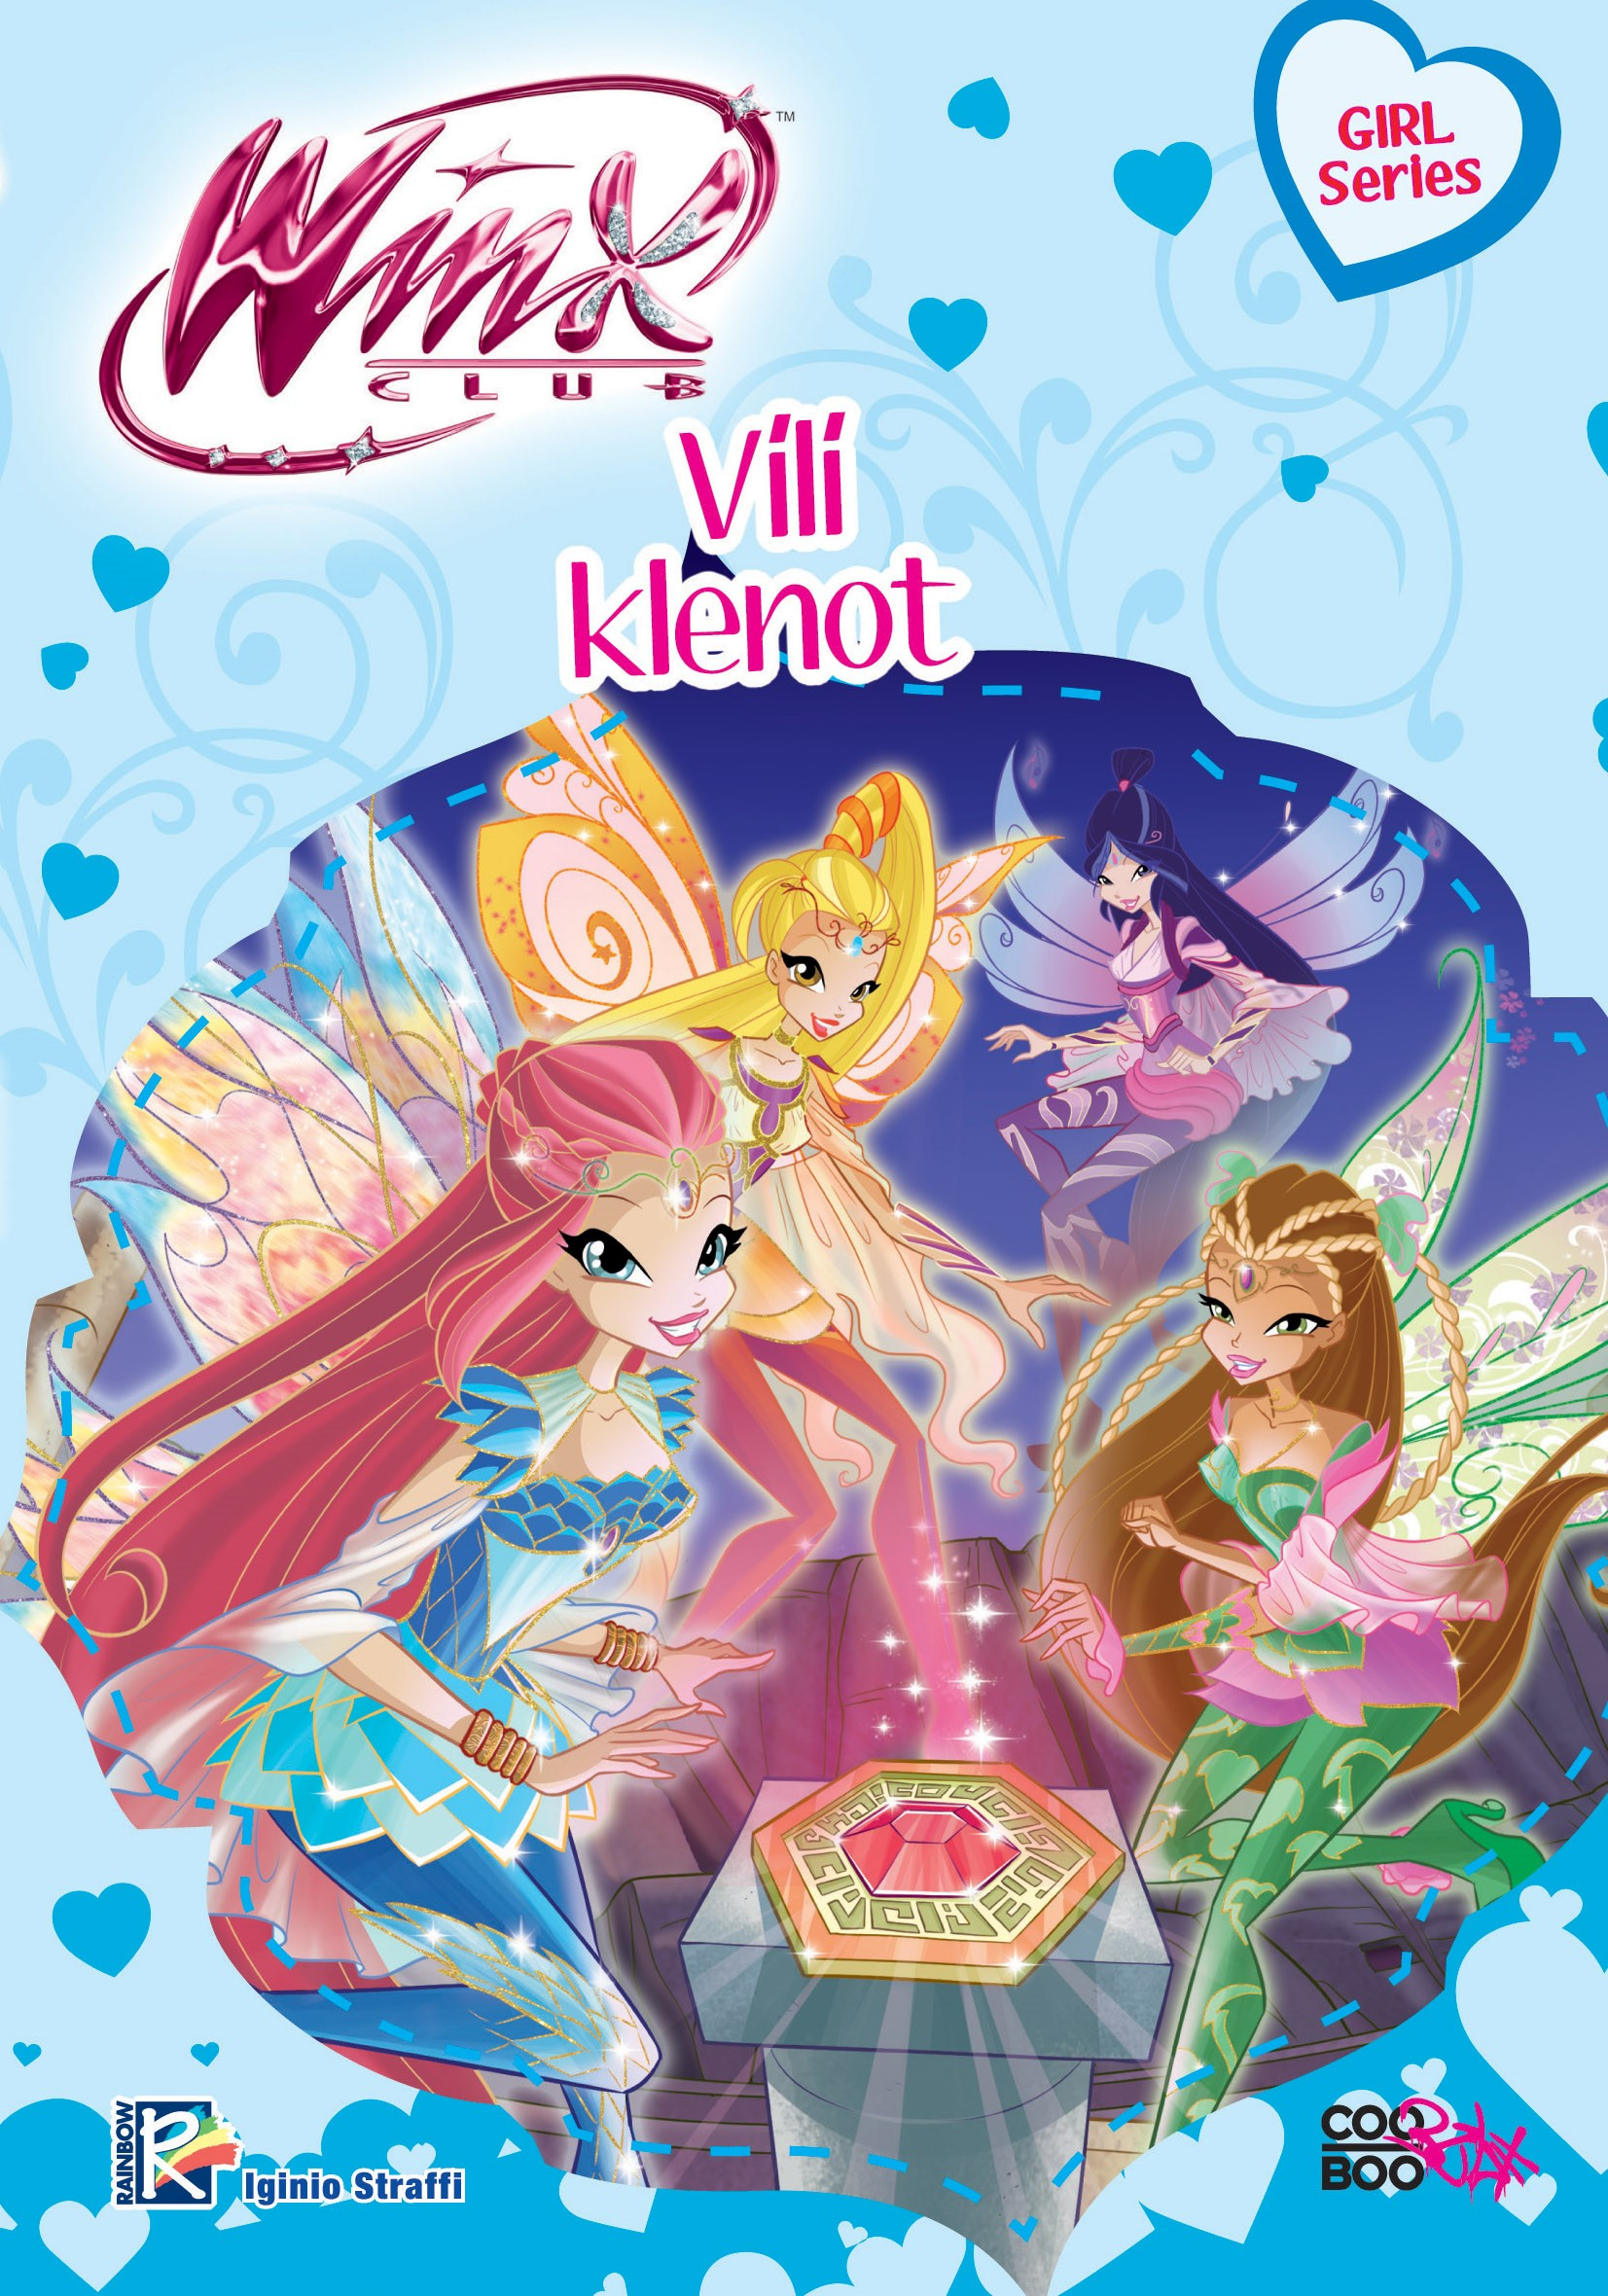 Winx Girl Series - Vílí klenot (4)